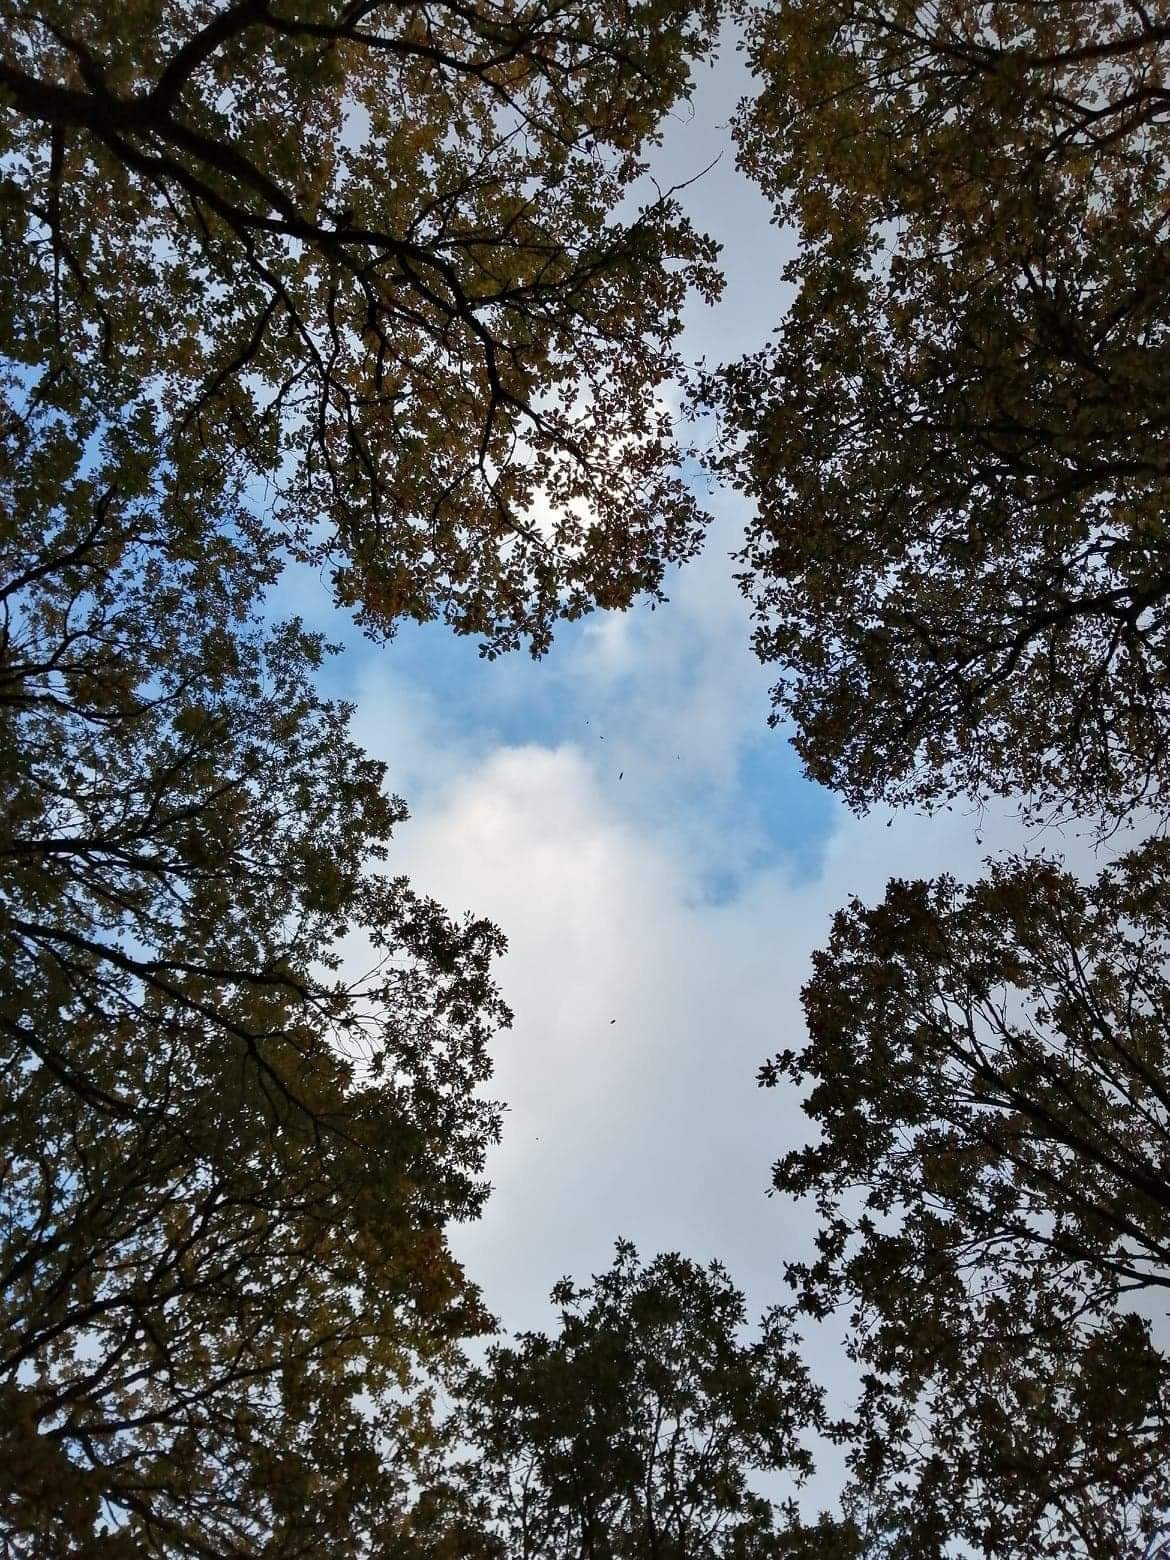 The sky through the trees, Abergorlech, Brechfa Forest